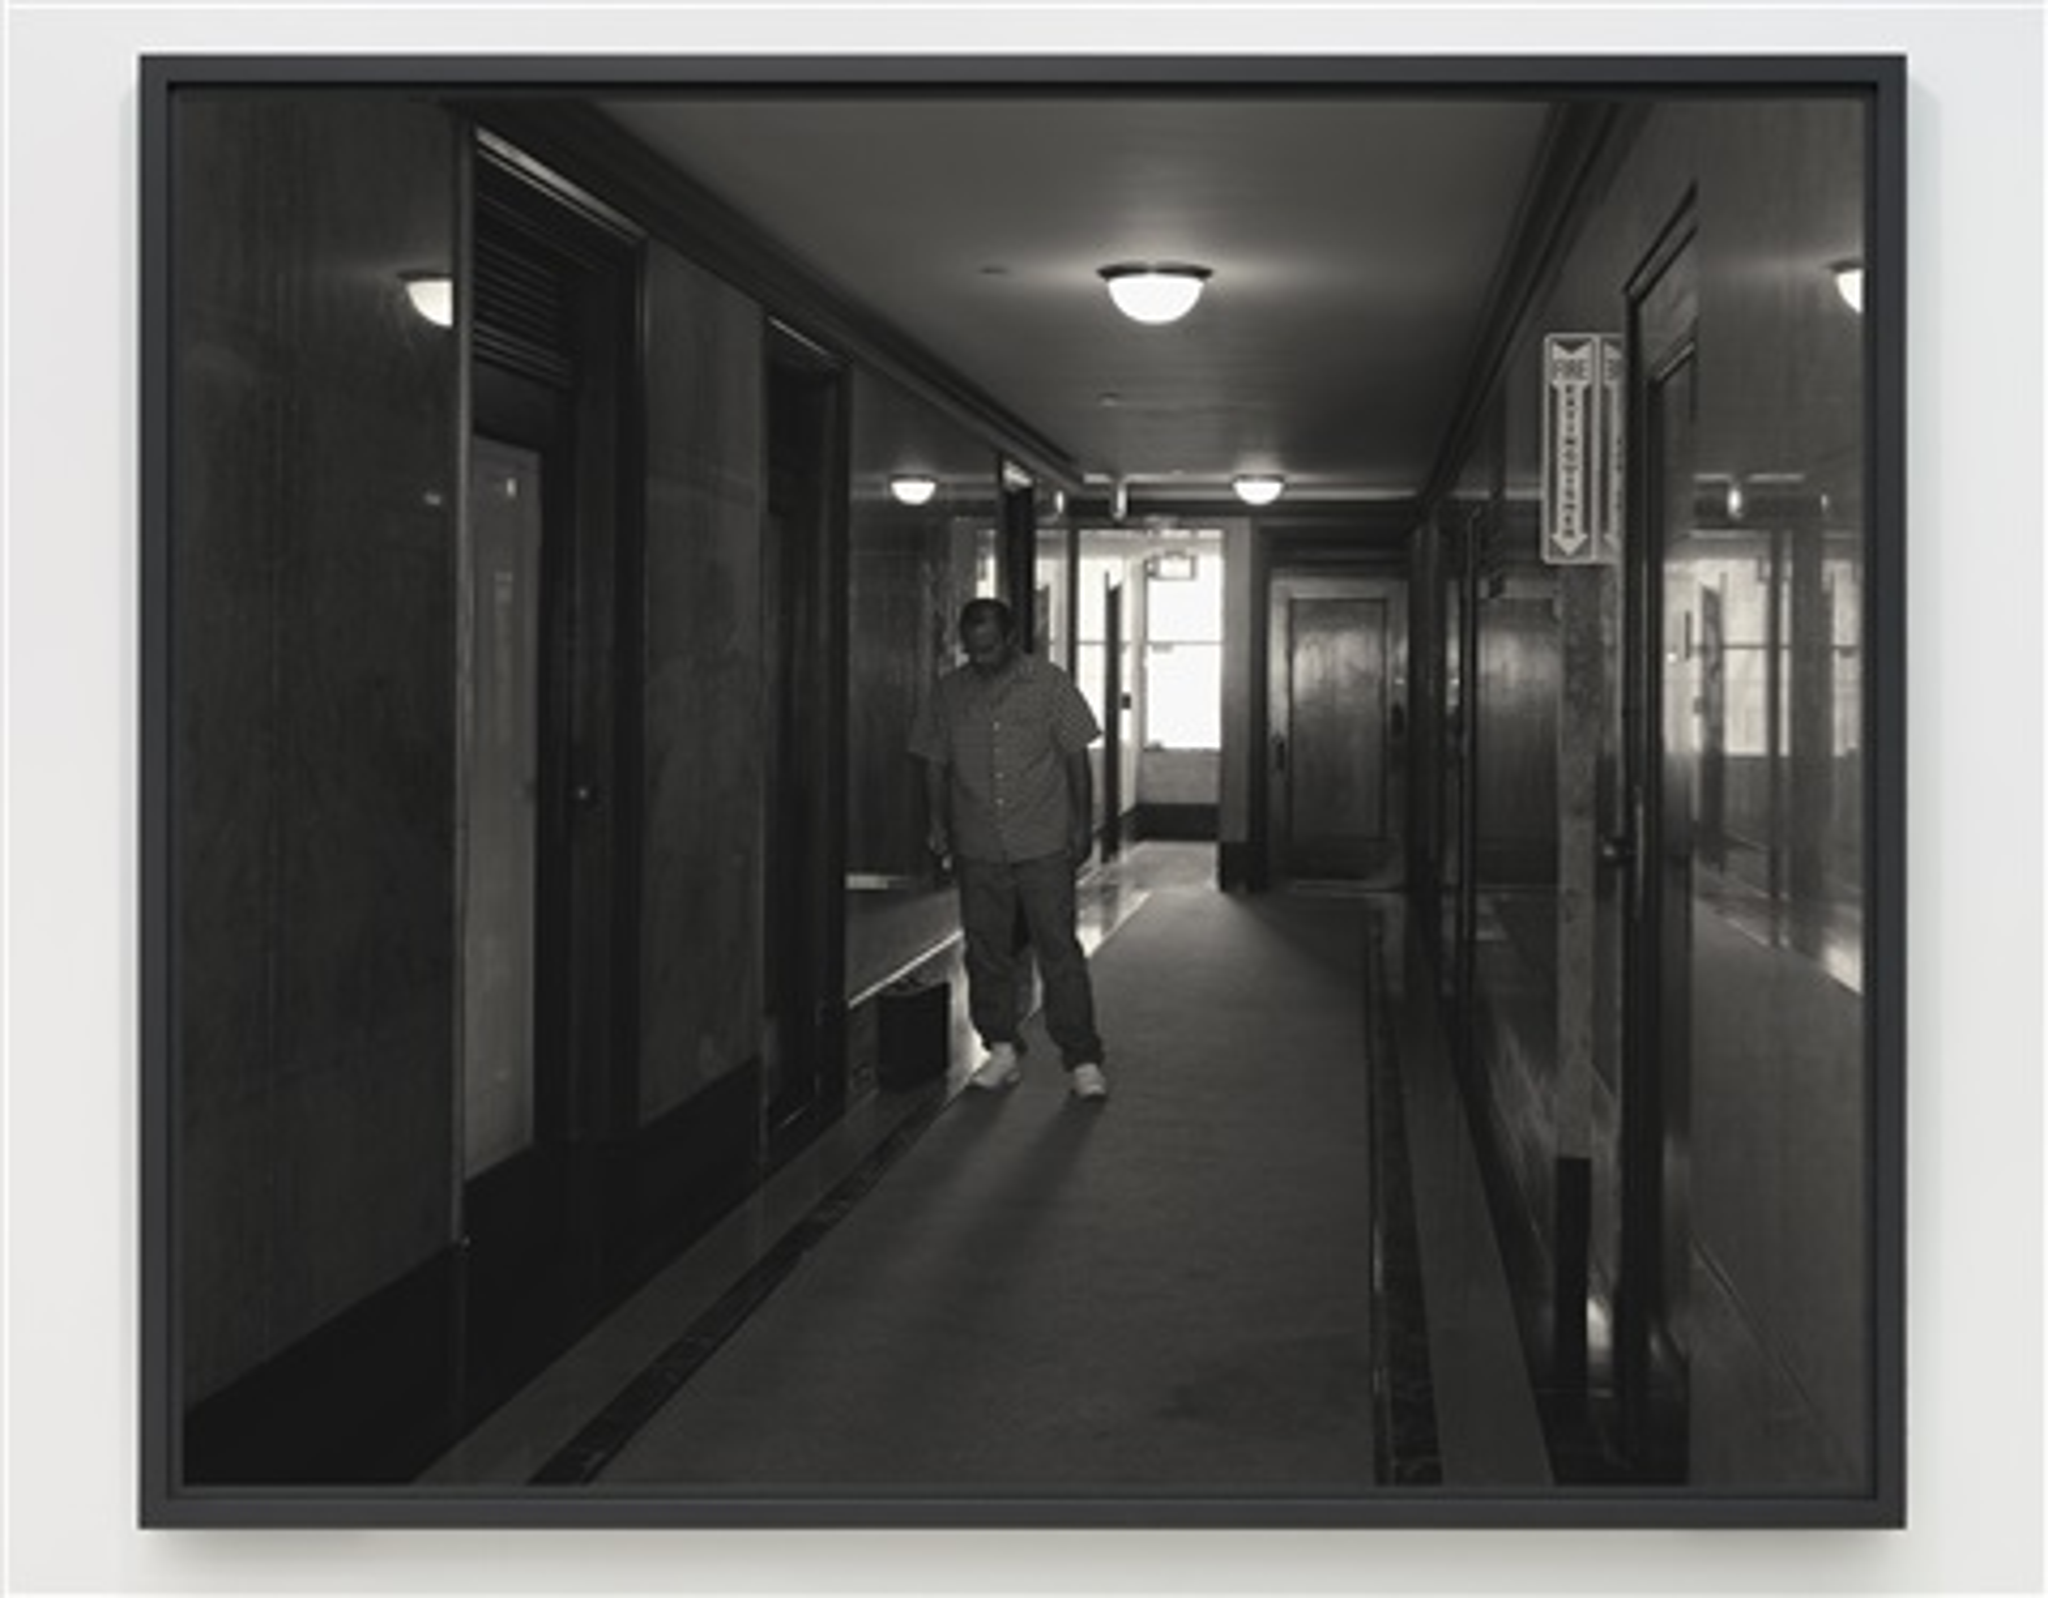 office hallway. Office Hallway, Spring Street, Los Angeles By Jeff Wall Hallway Y